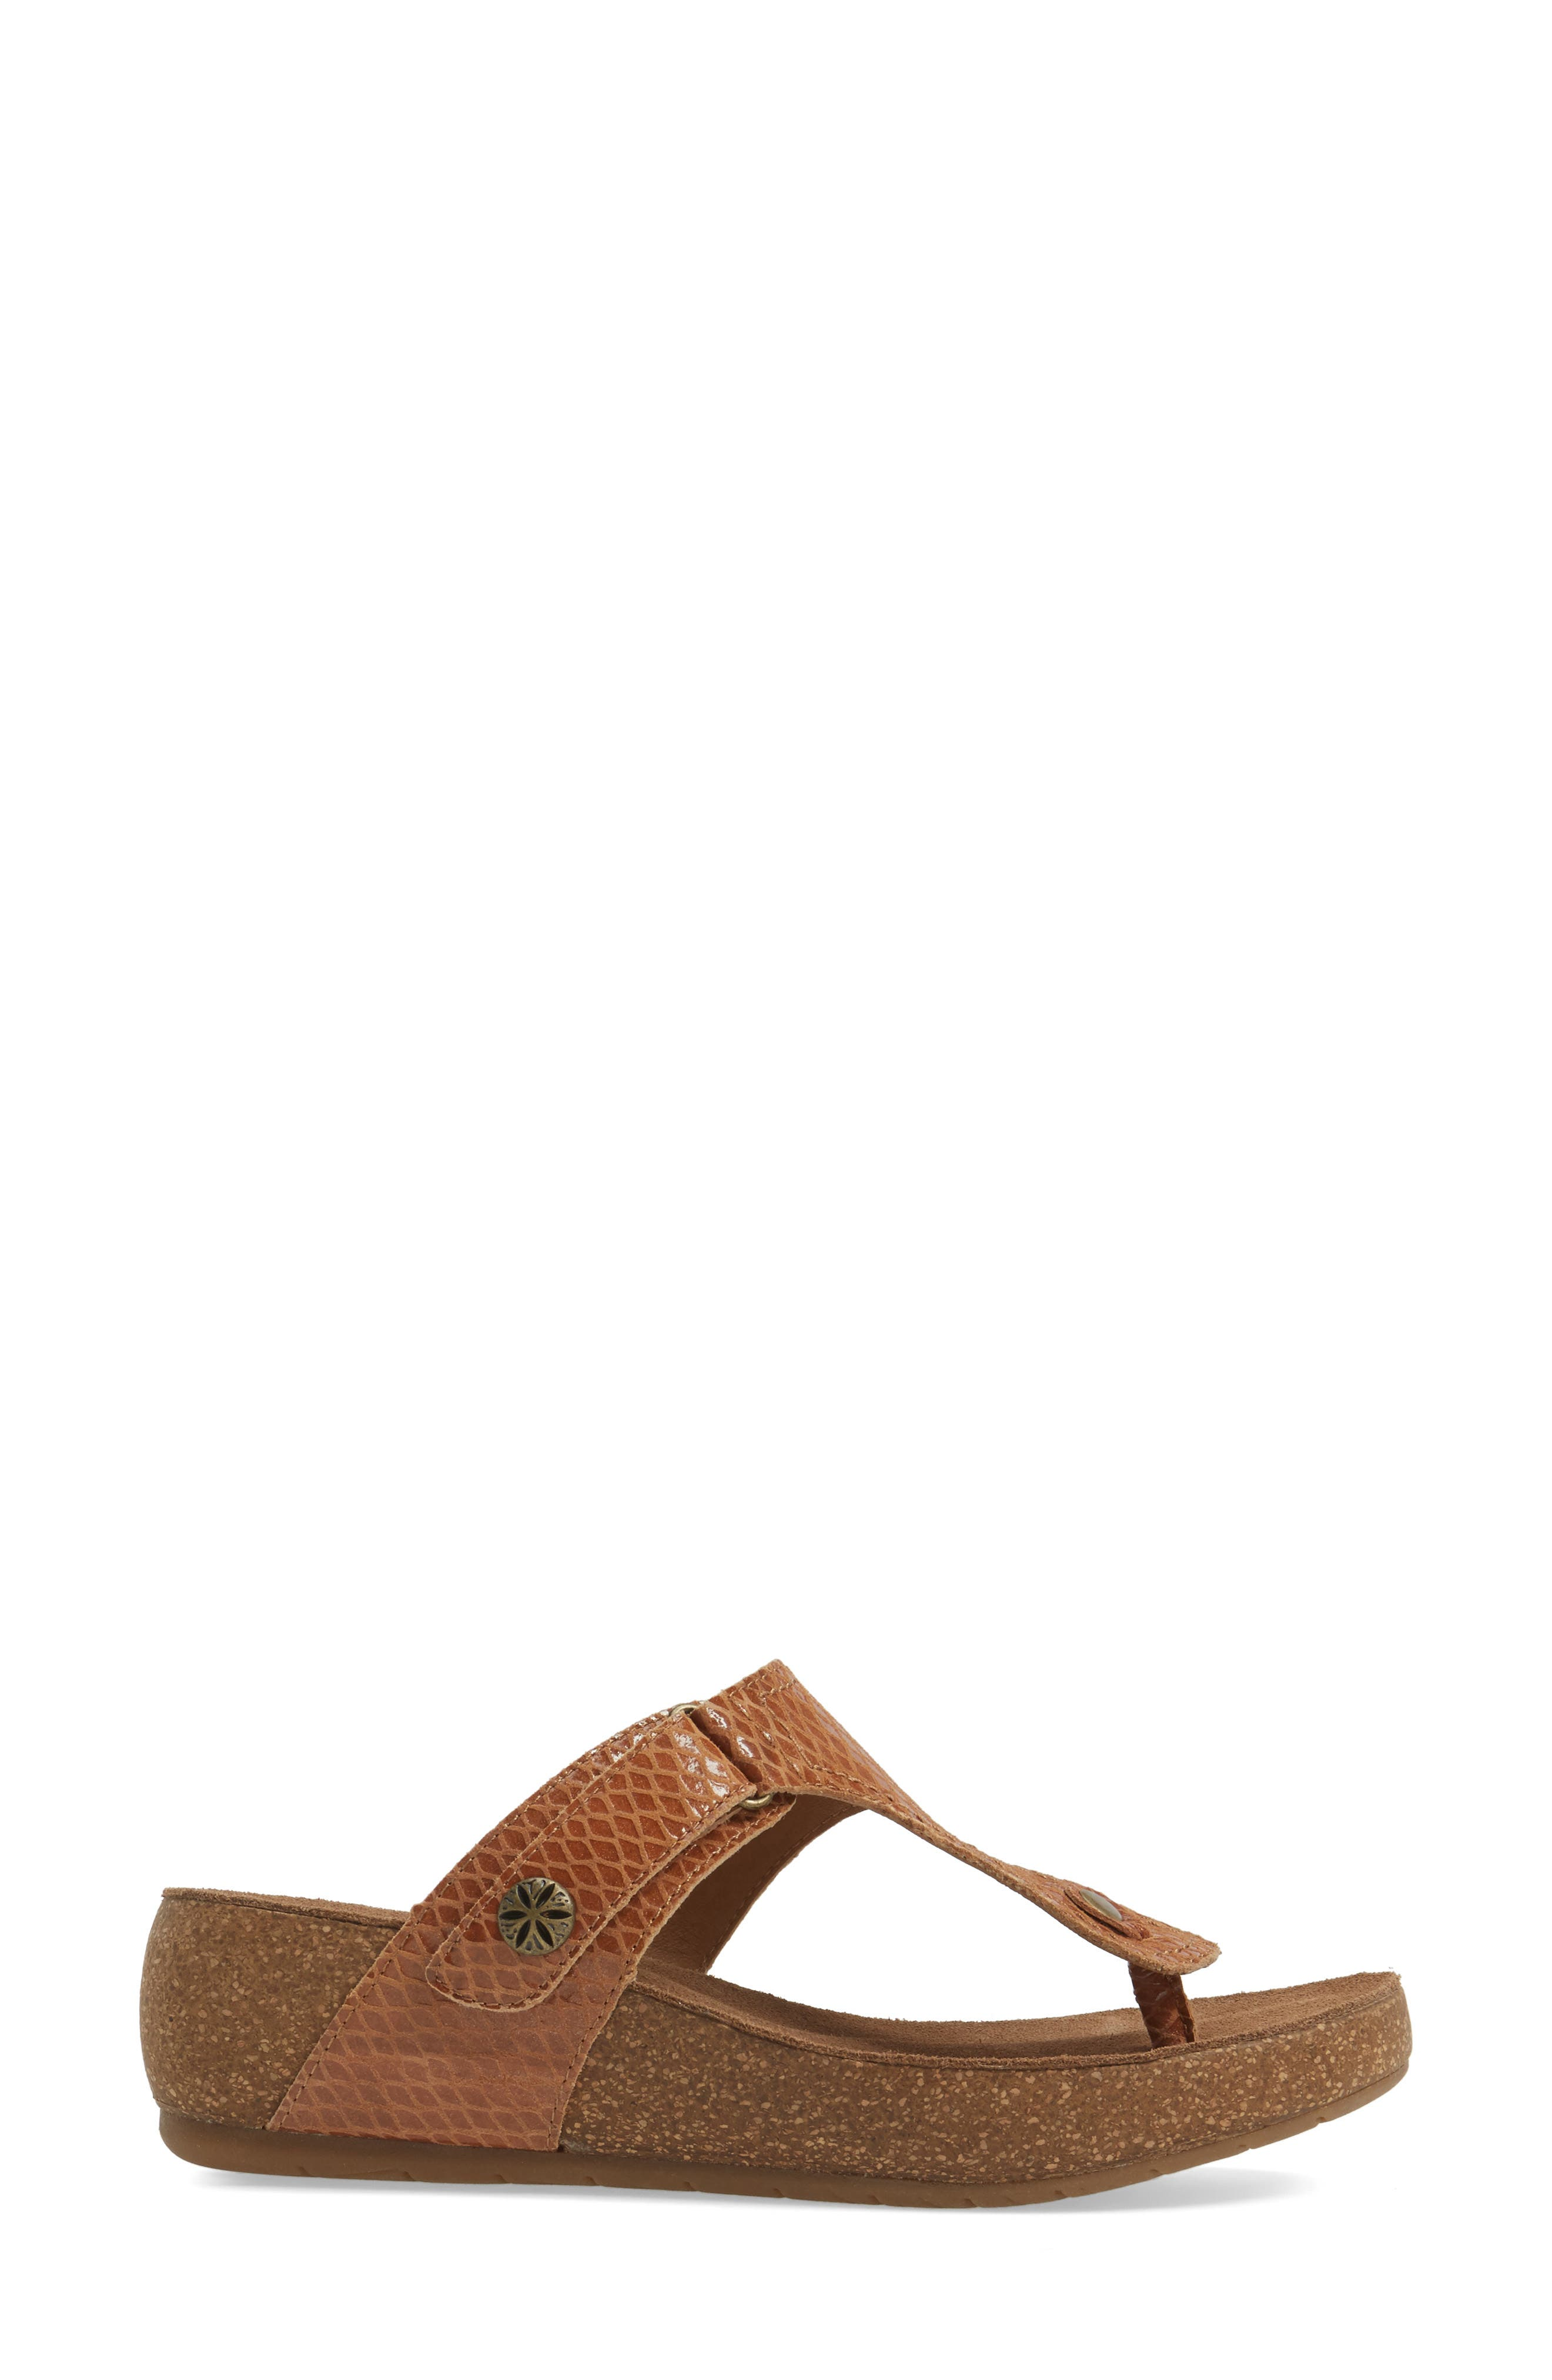 Shantel Flip Flop,                             Alternate thumbnail 3, color,                             Luggage Print Leather